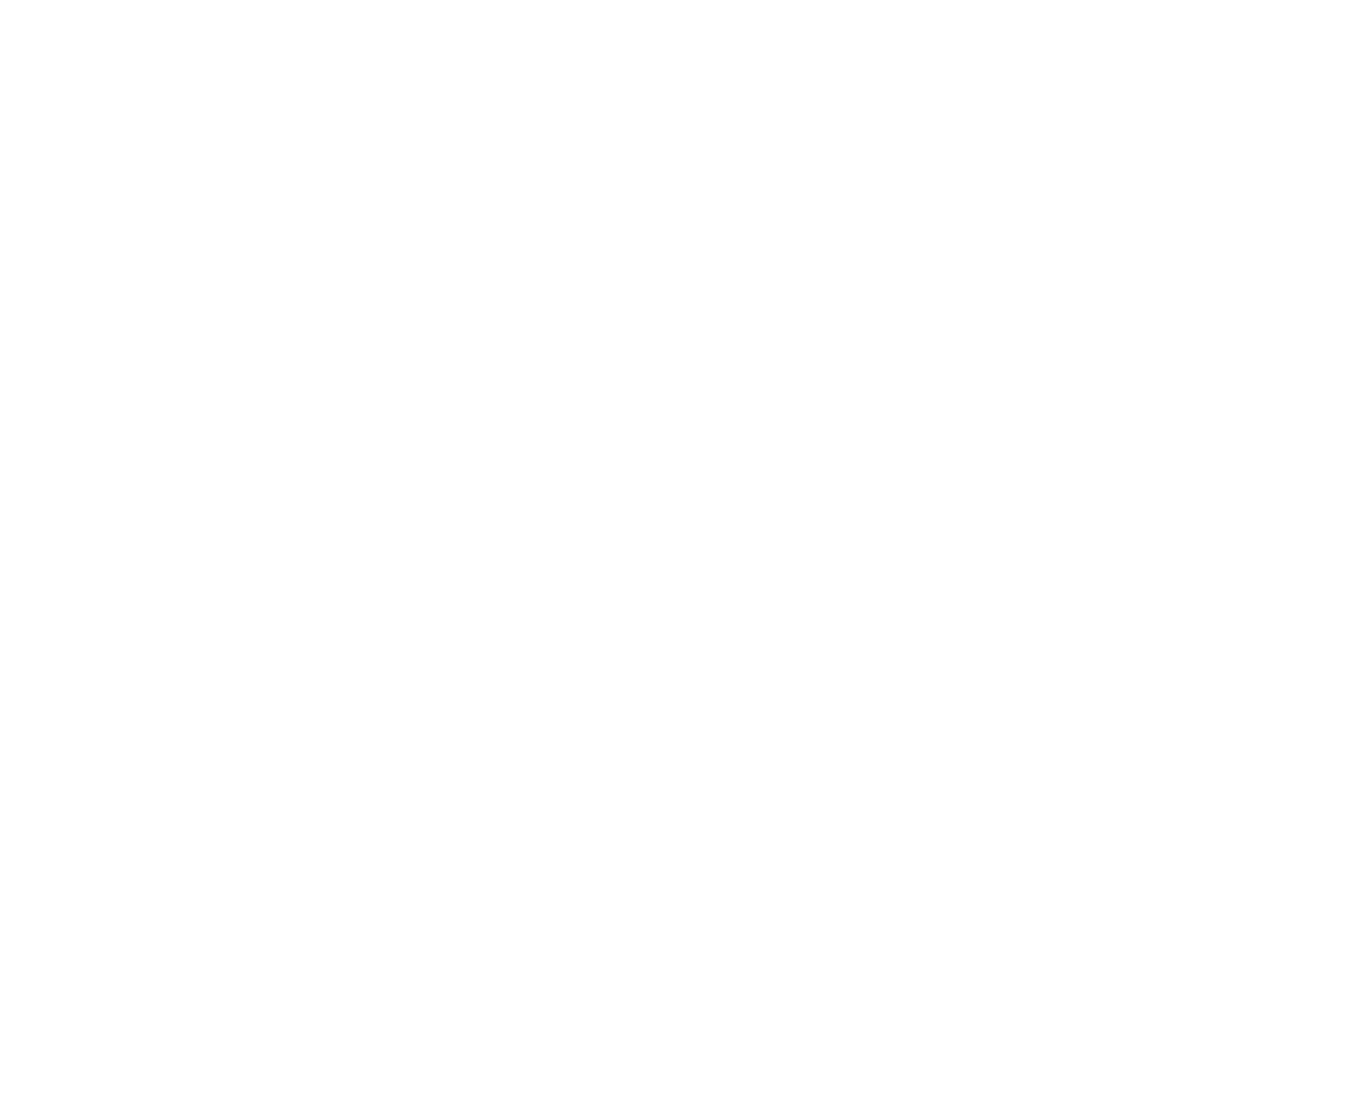 Lekker Stroopwafel Manufaktúra